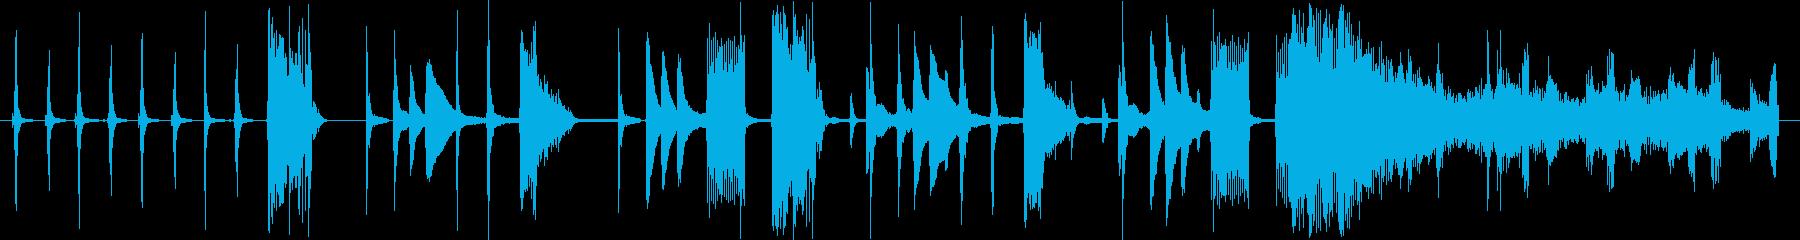 BGM for CM using various clock sounds's reproduced waveform